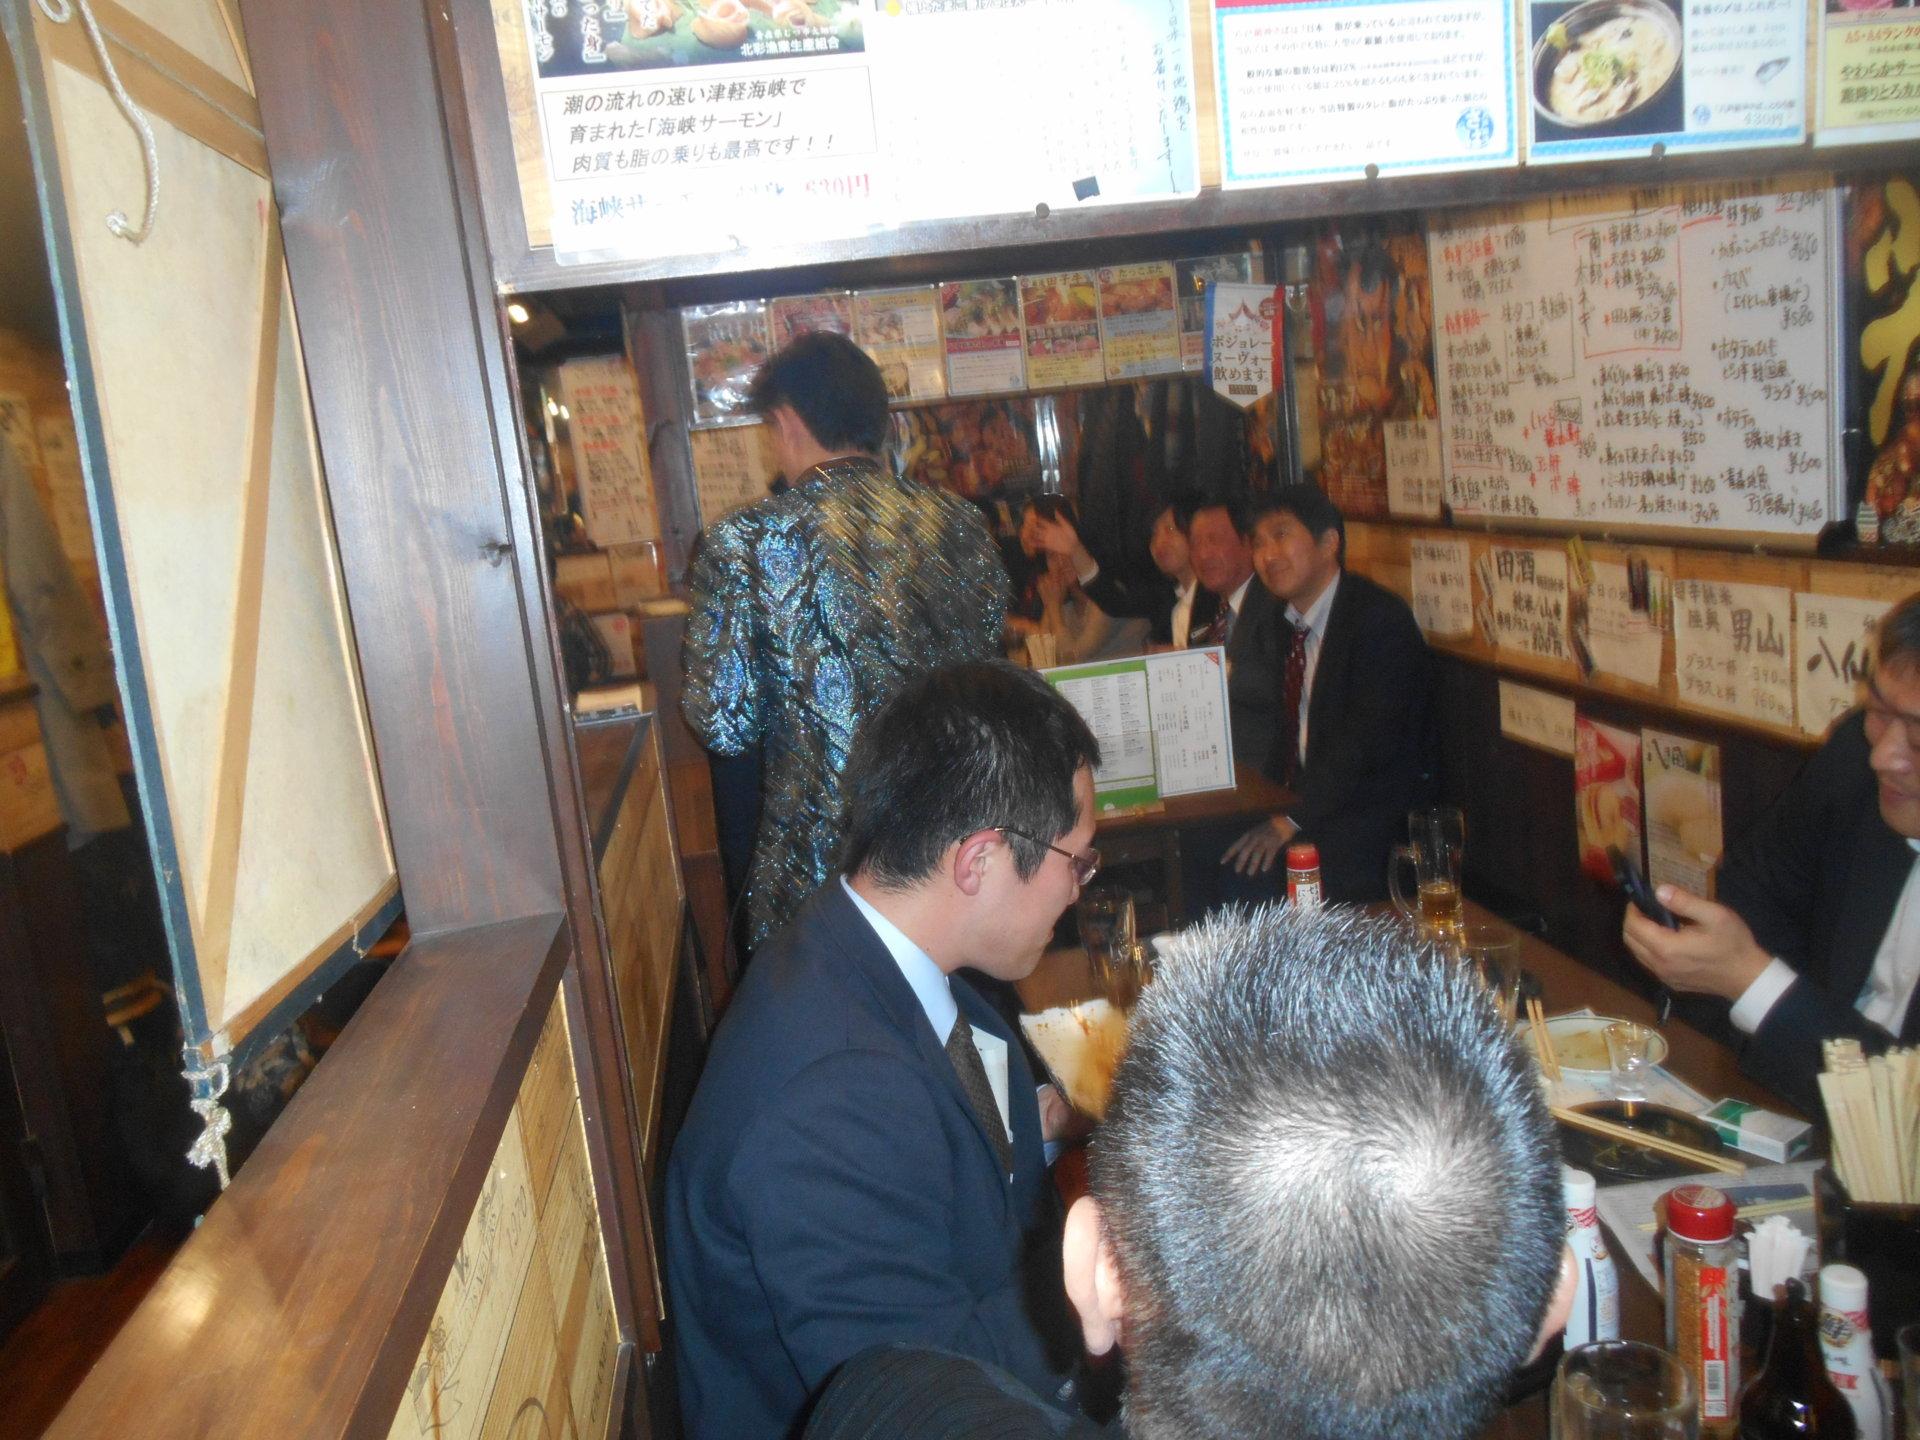 DSCN0625 1920x1440 - 2015年12月21日(月) AOsuki忘年会開催しました。